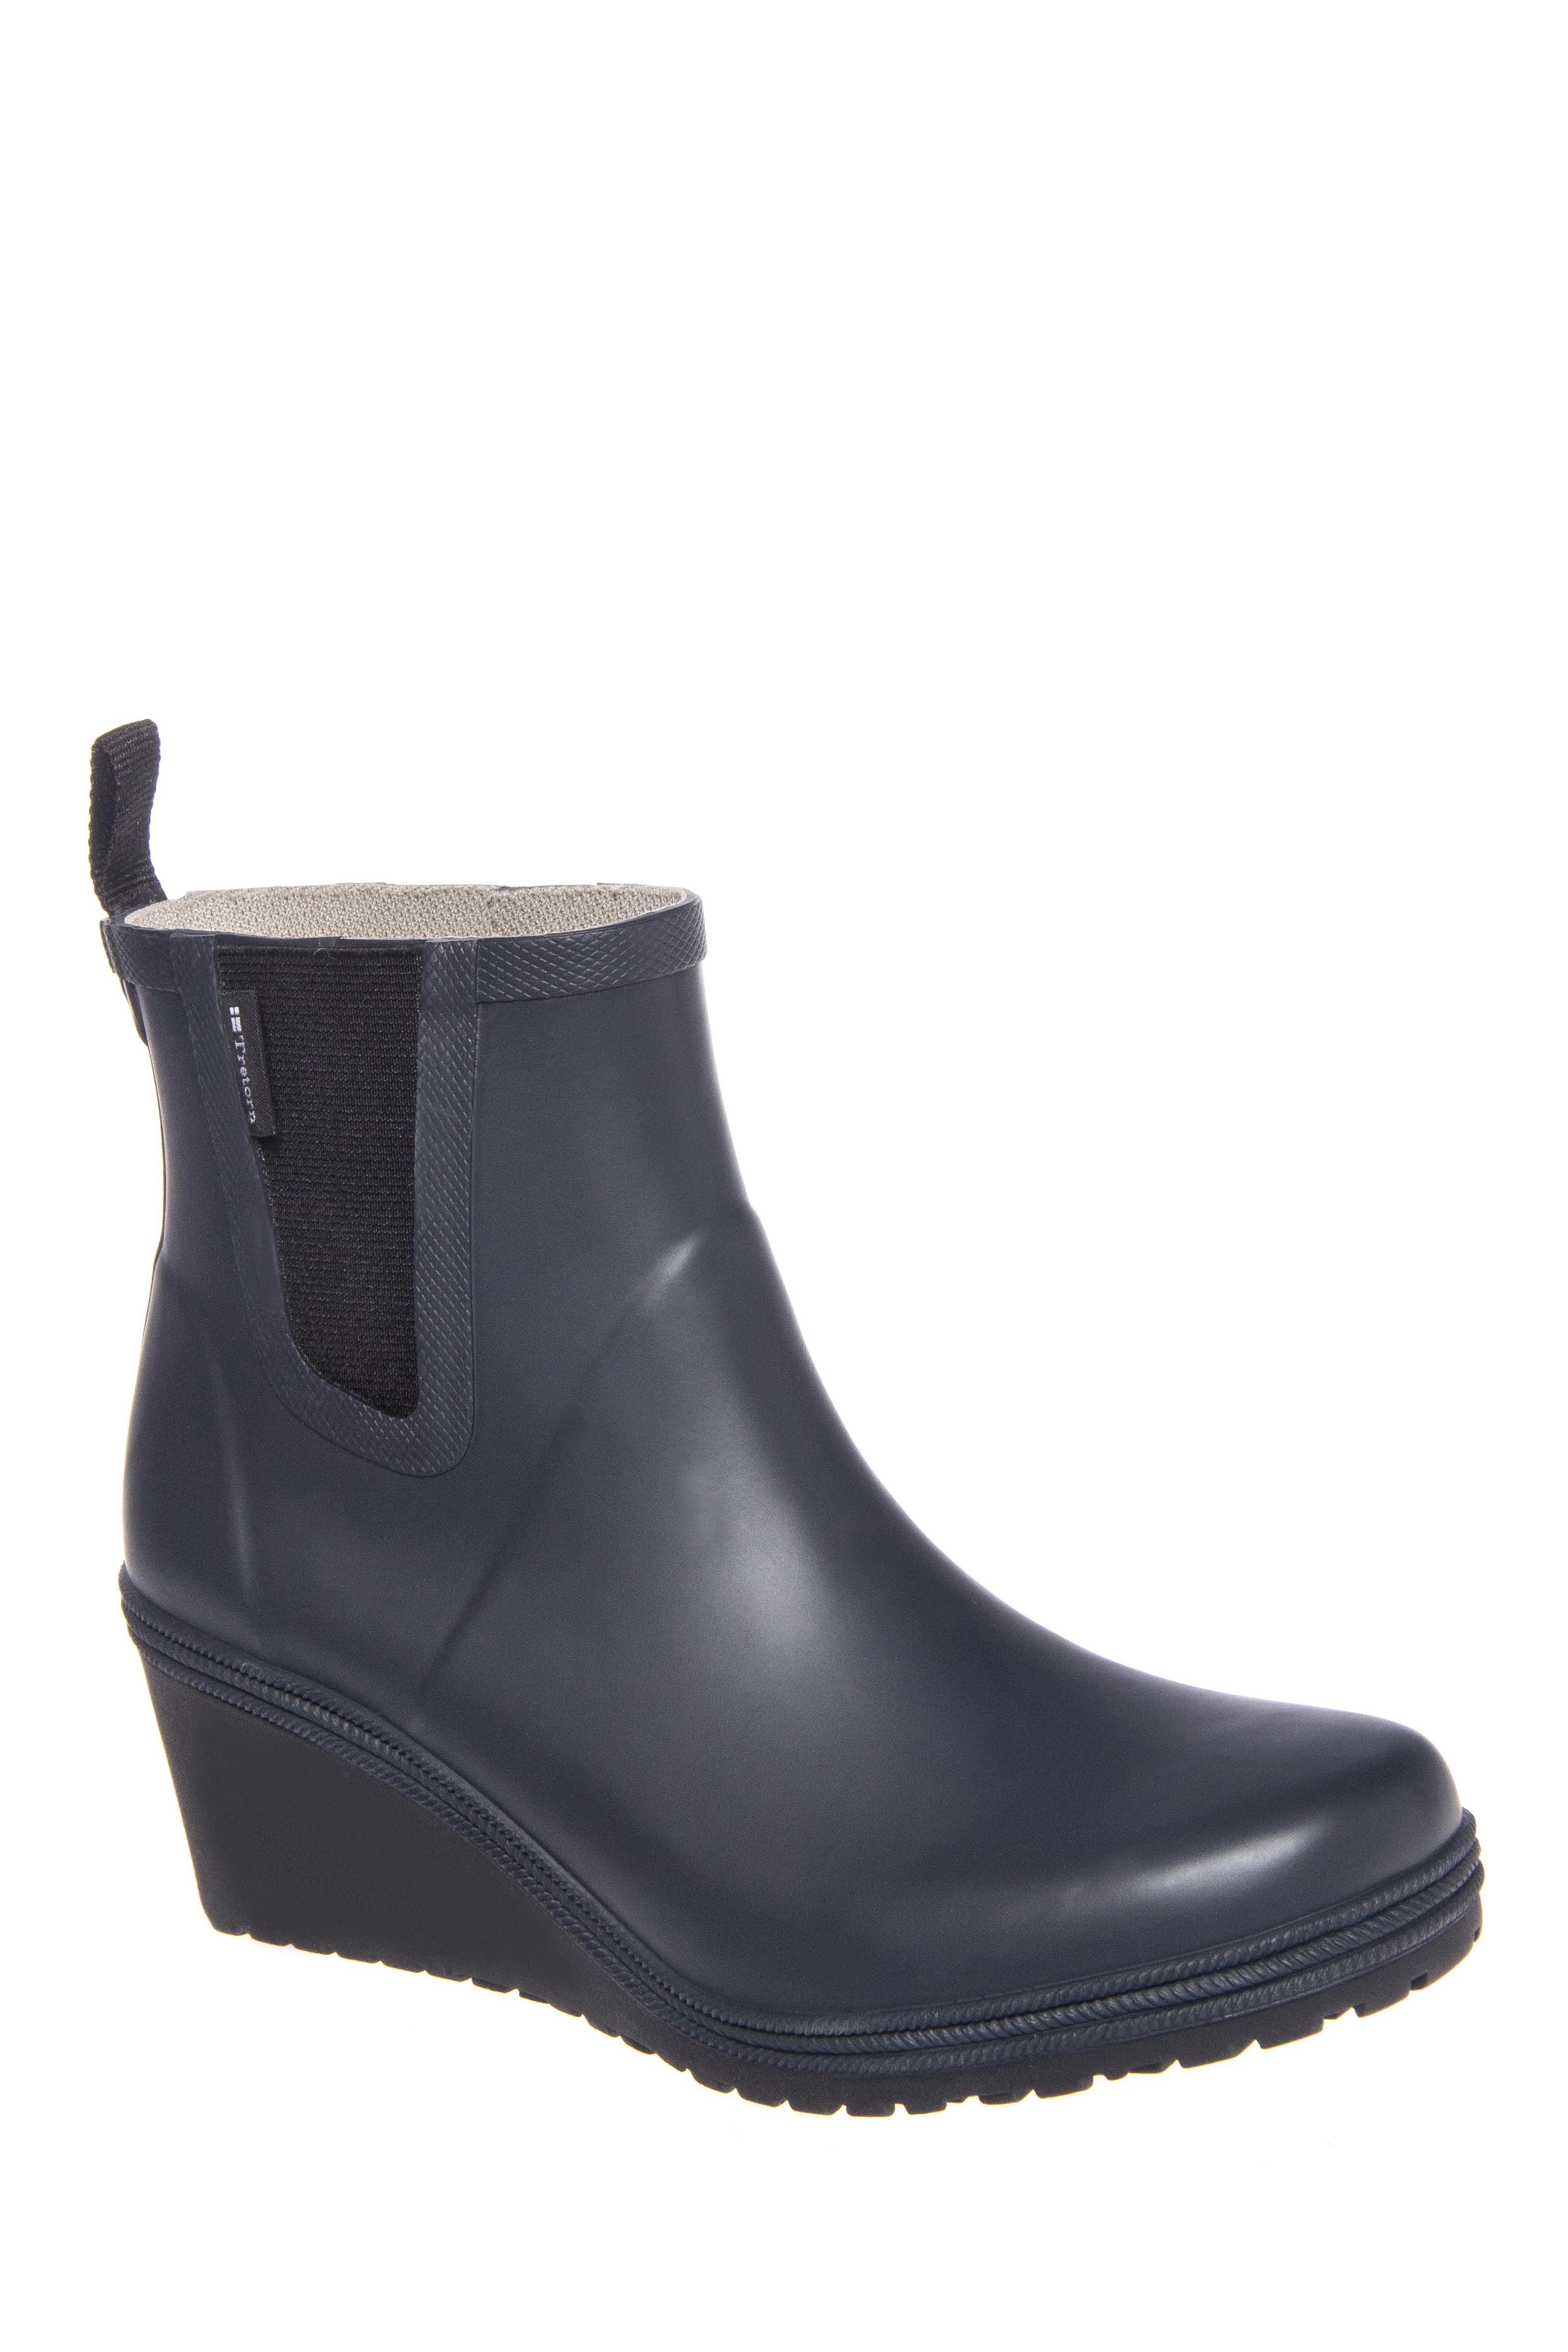 Tretorn Emma Mid Wedge Rain Boots - Navy